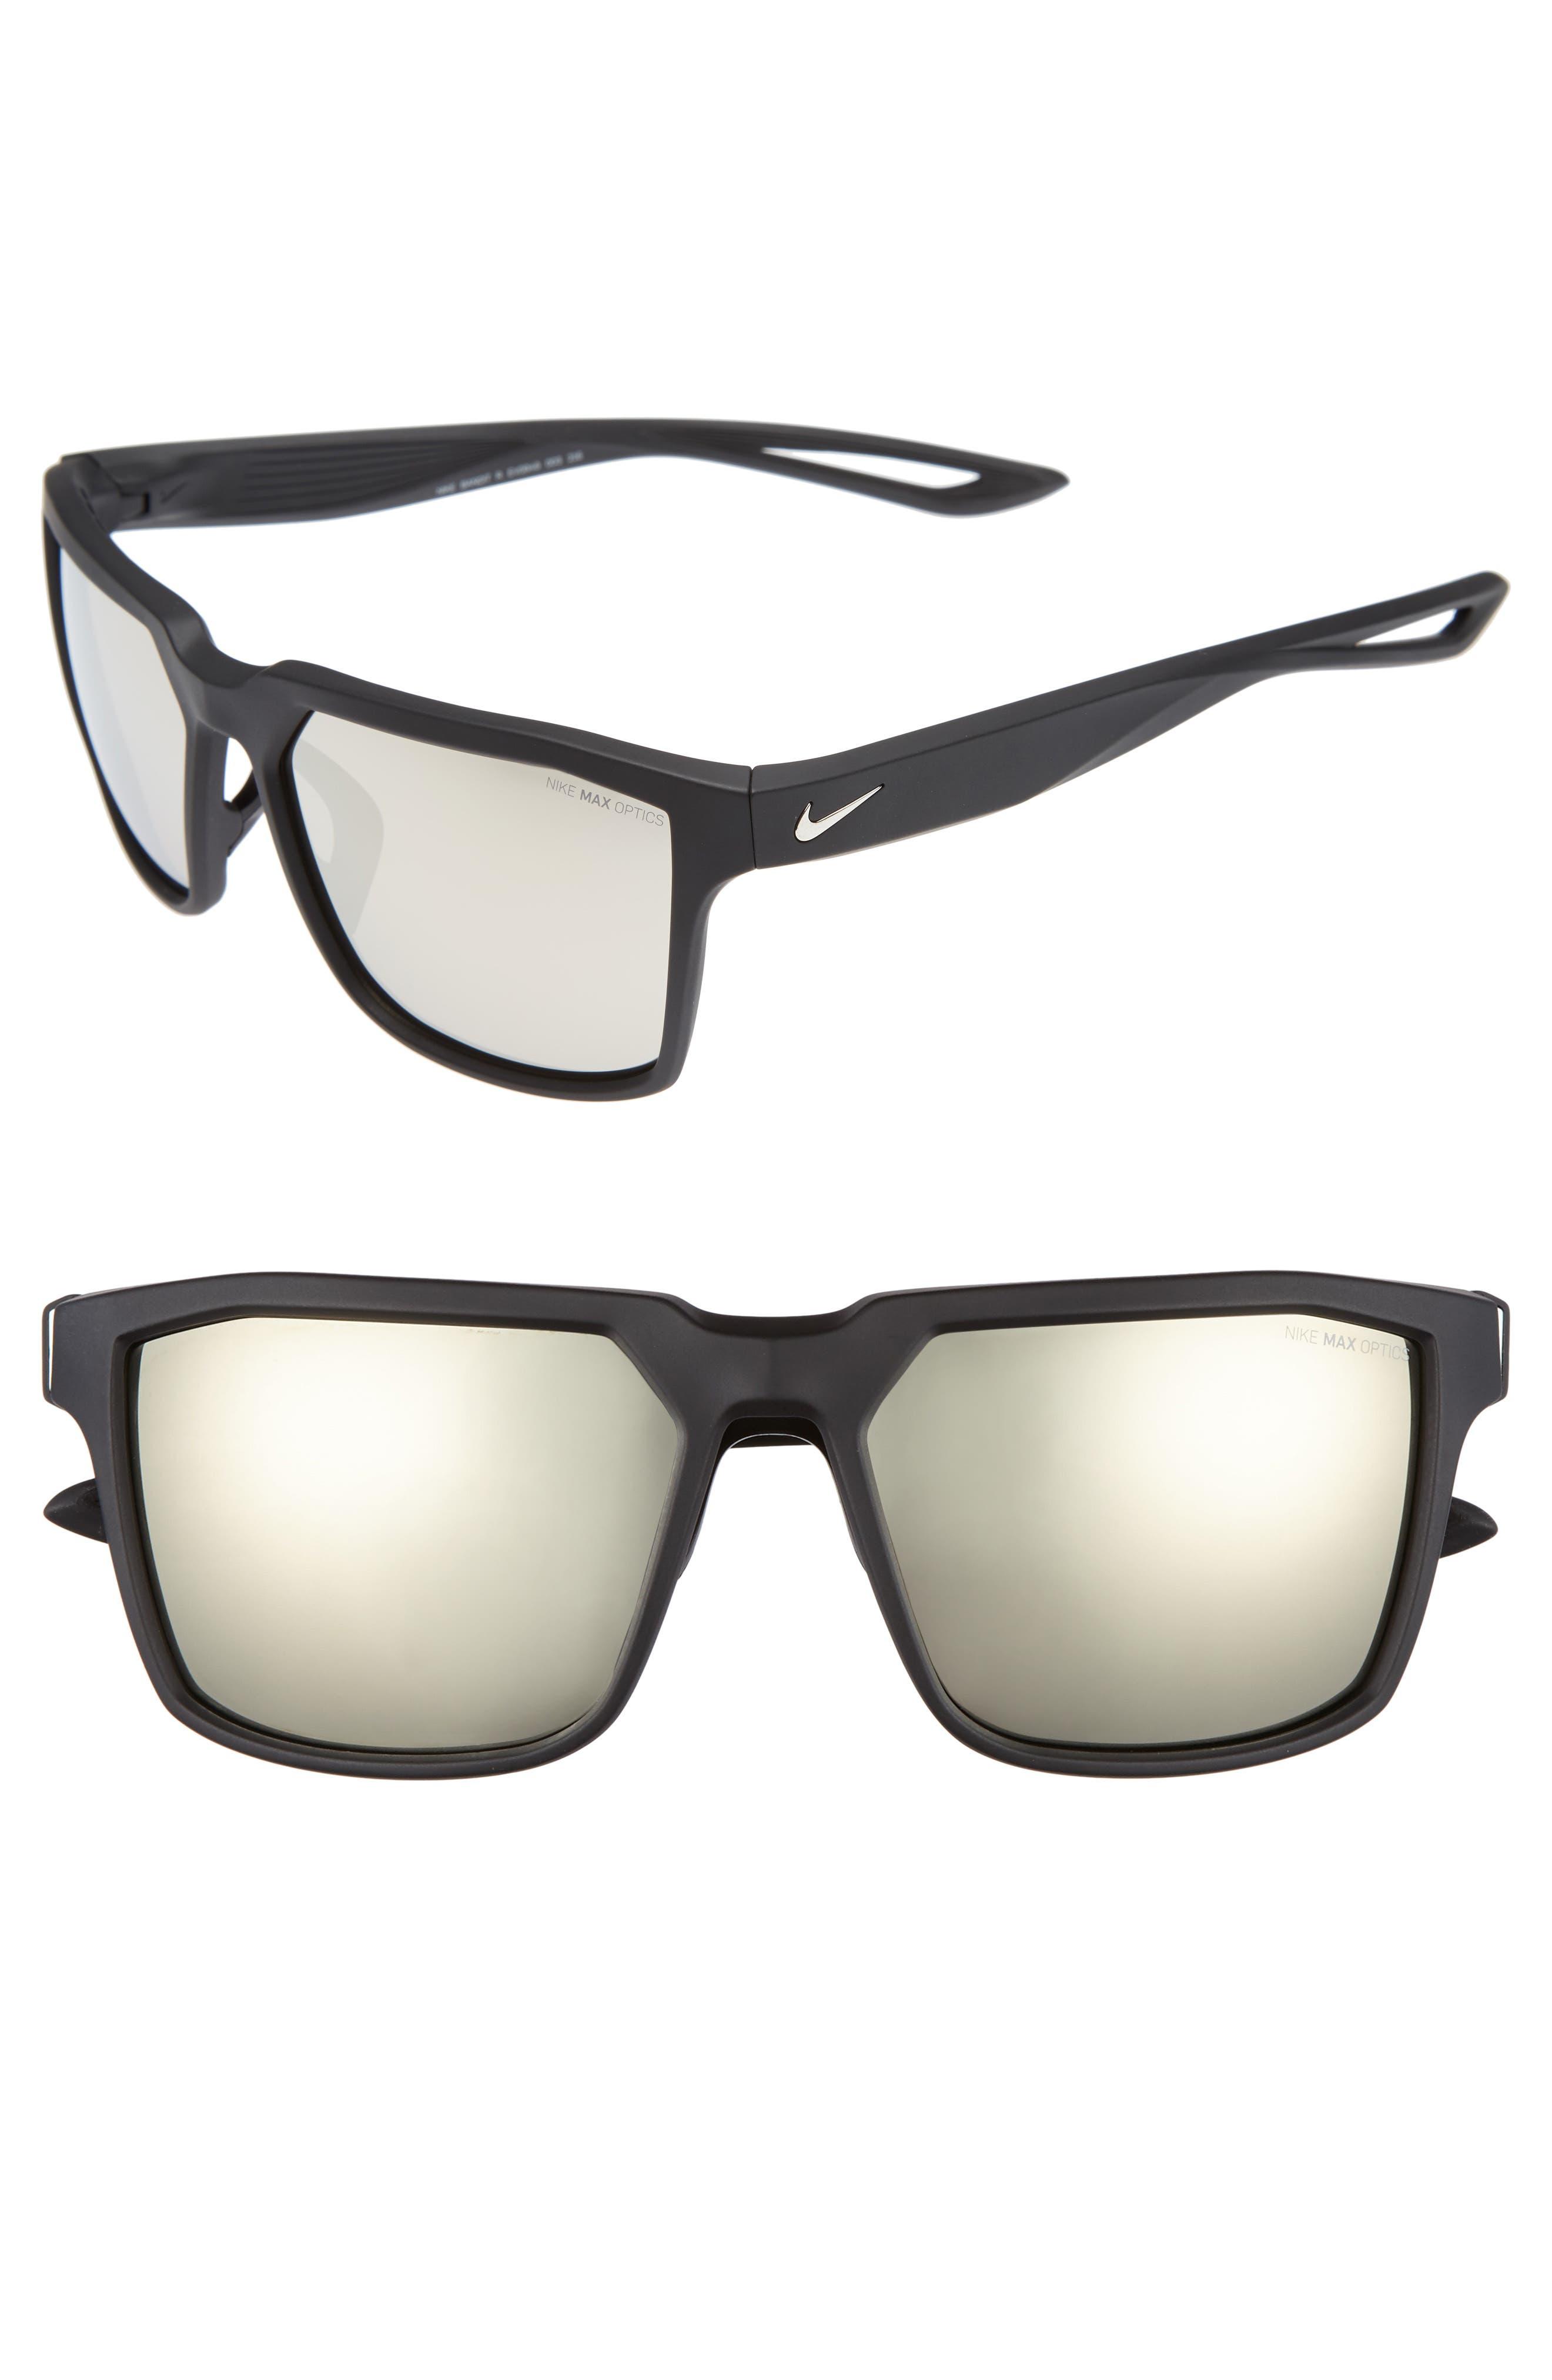 NIKE, Bandit R 59mm Sunglasses, Main thumbnail 1, color, MATTE BLACK/ SILVER